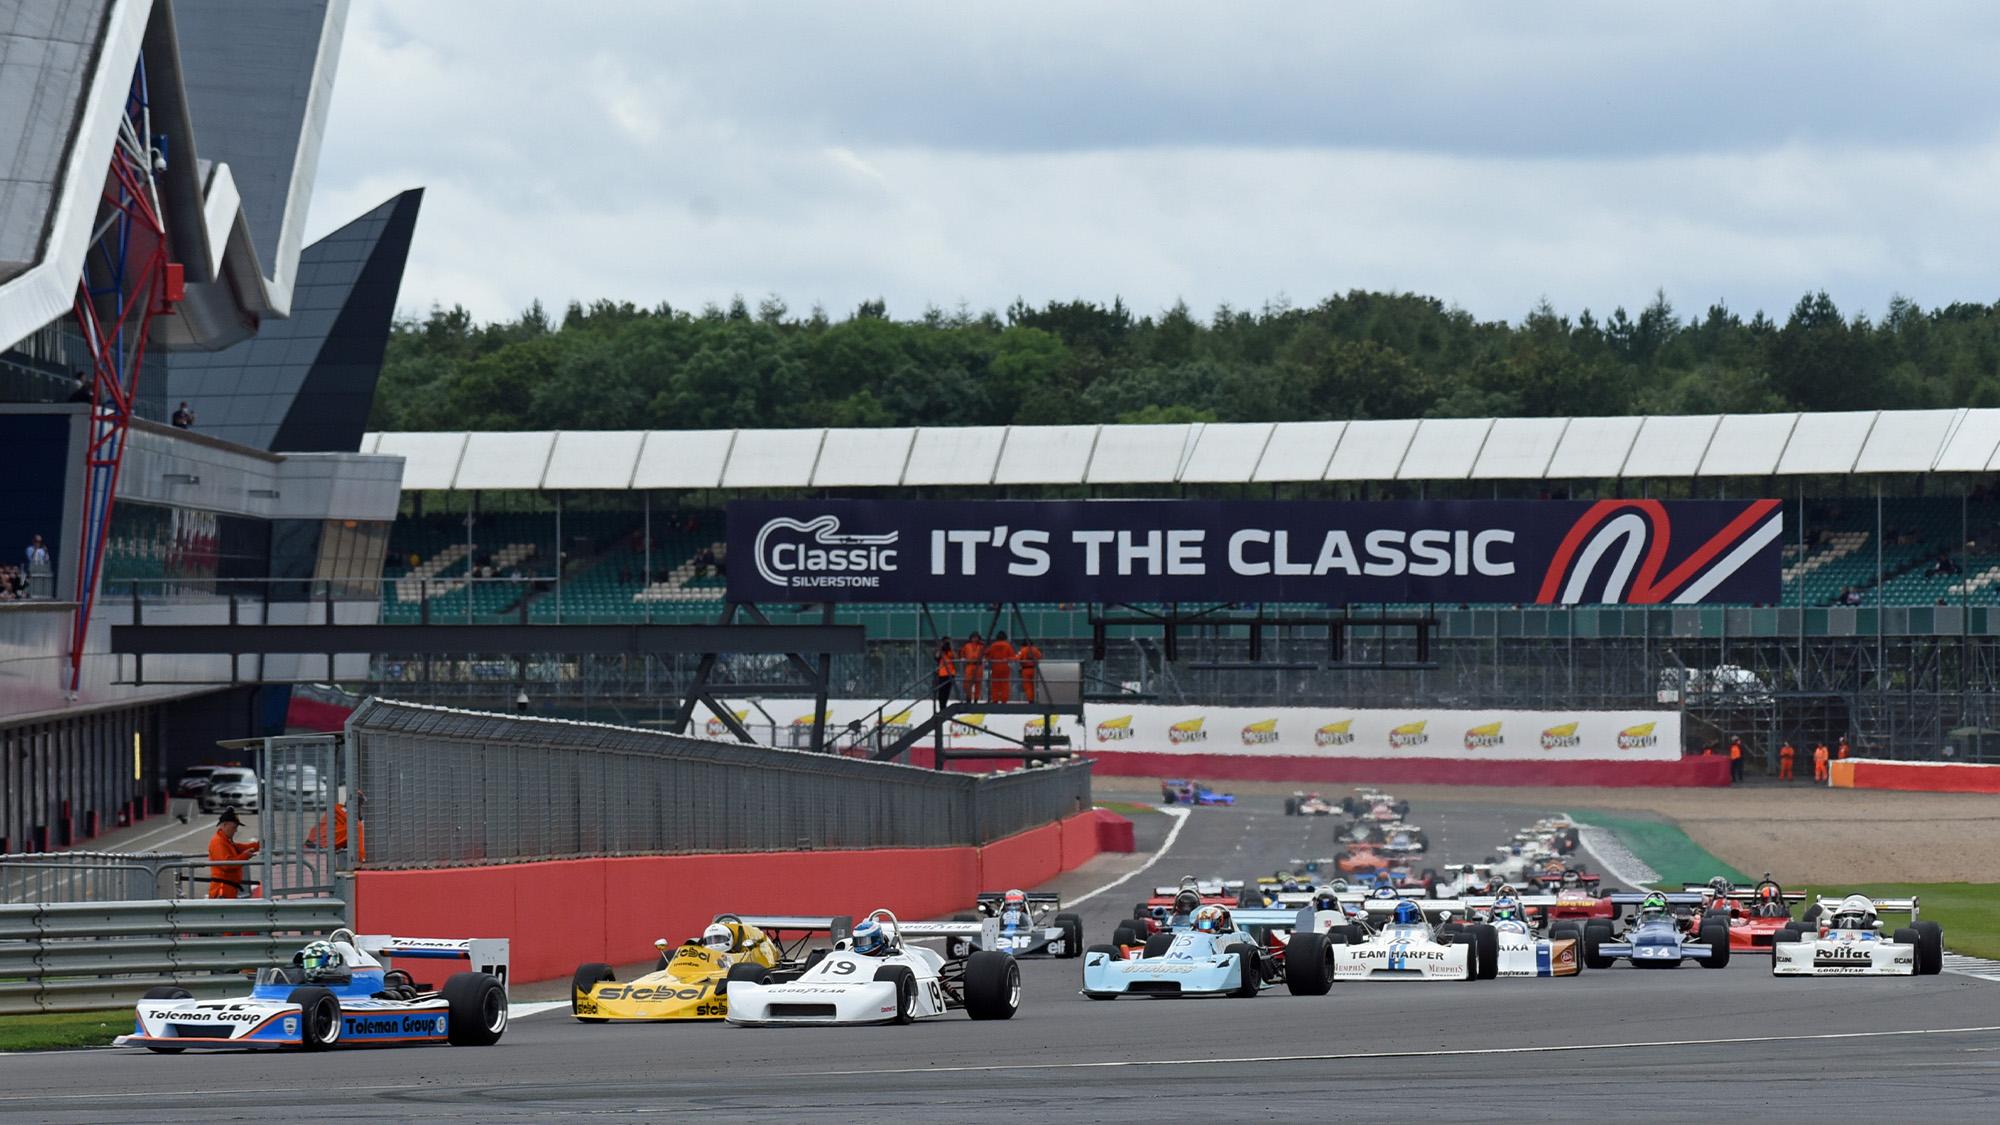 Formula 2 cars at Silverstone